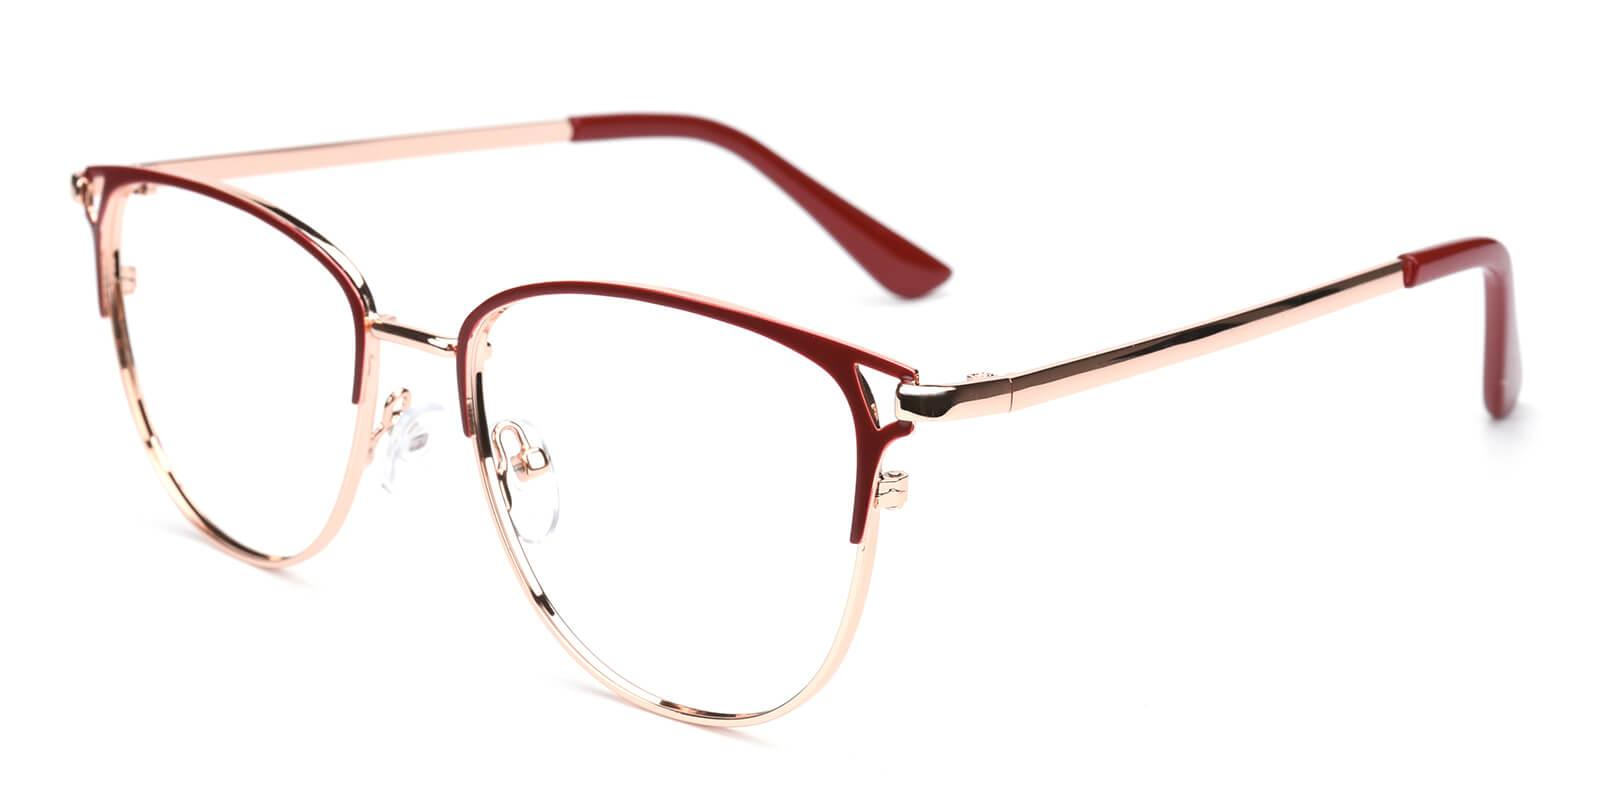 Geraldine-Red-Browline-Metal-Eyeglasses-additional1